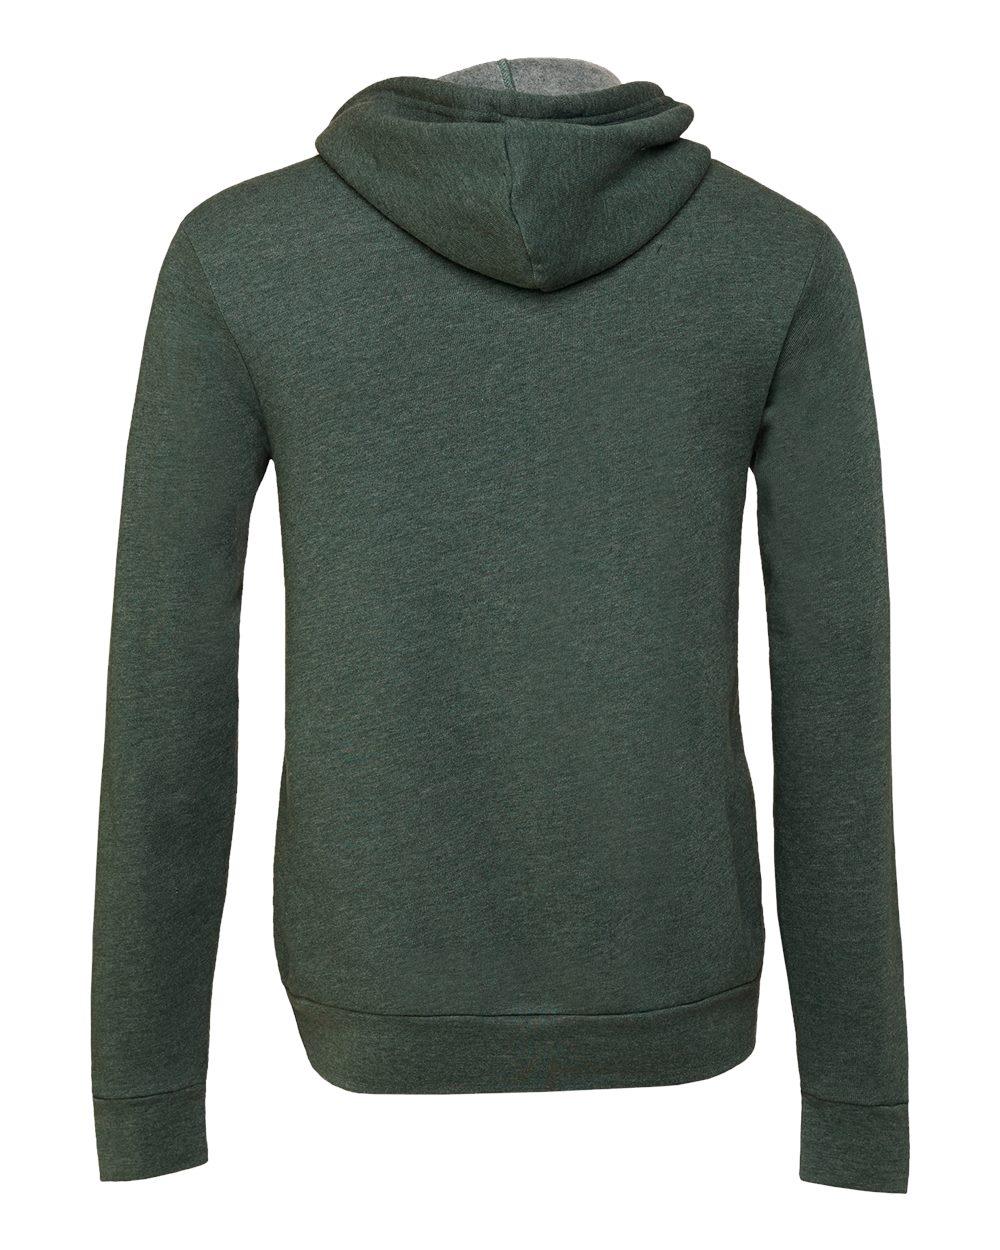 Bella-Canvas-Unisex-Full-Zip-Up-Hooded-Sweatshirt-Blank-Hoodie-3739-up-to-3XL thumbnail 39